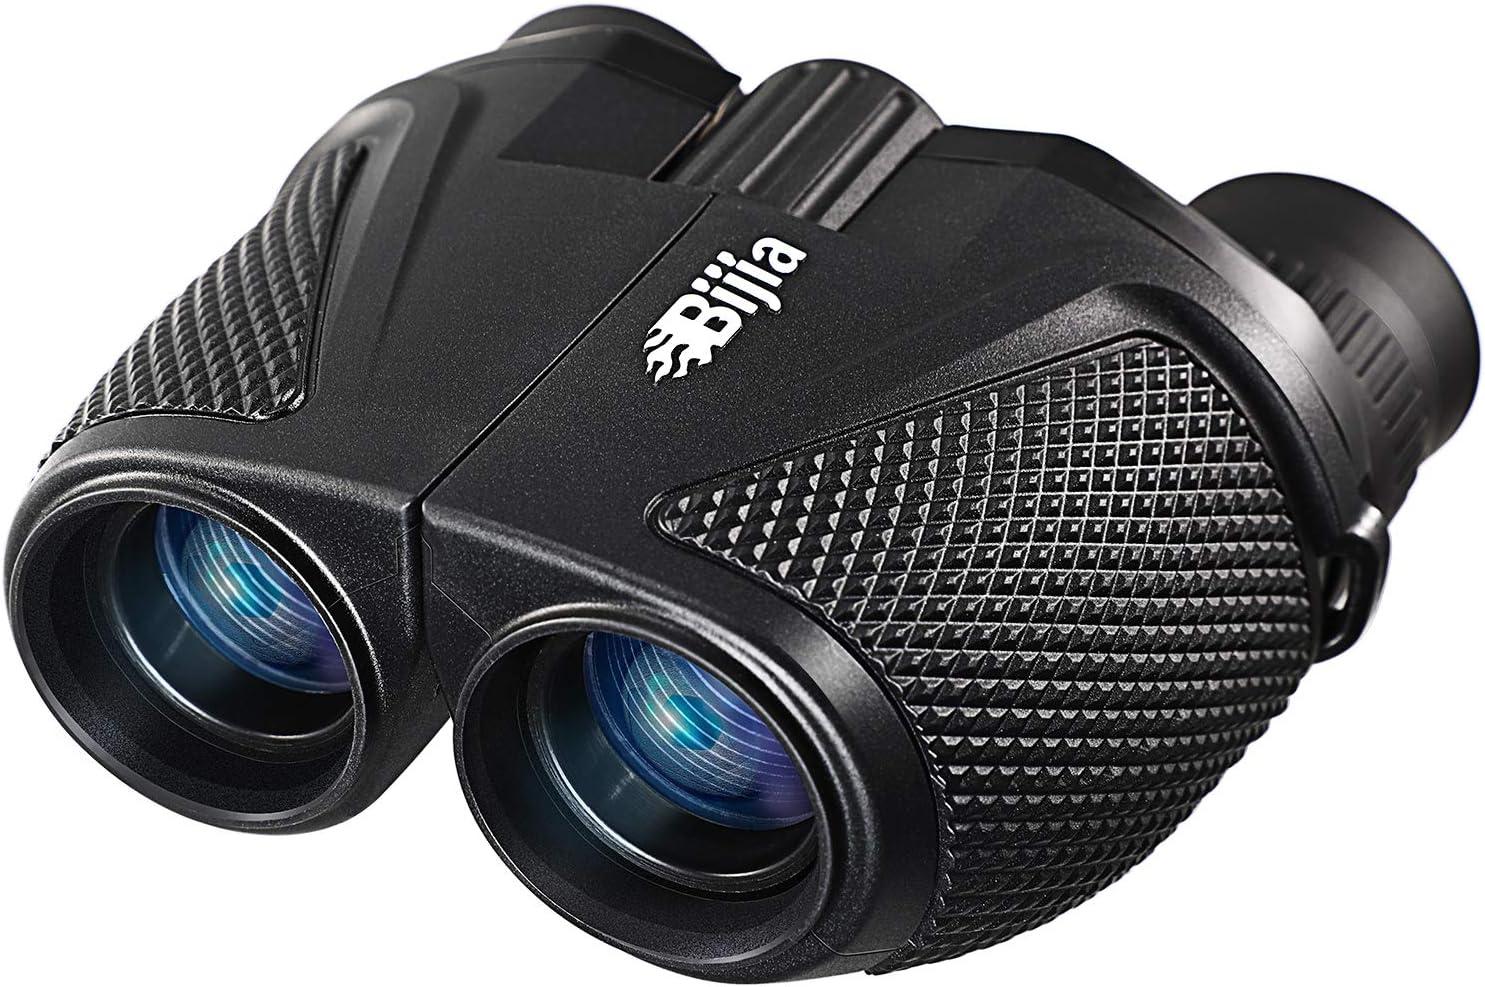 G4Free 12x25 Compact Binocular